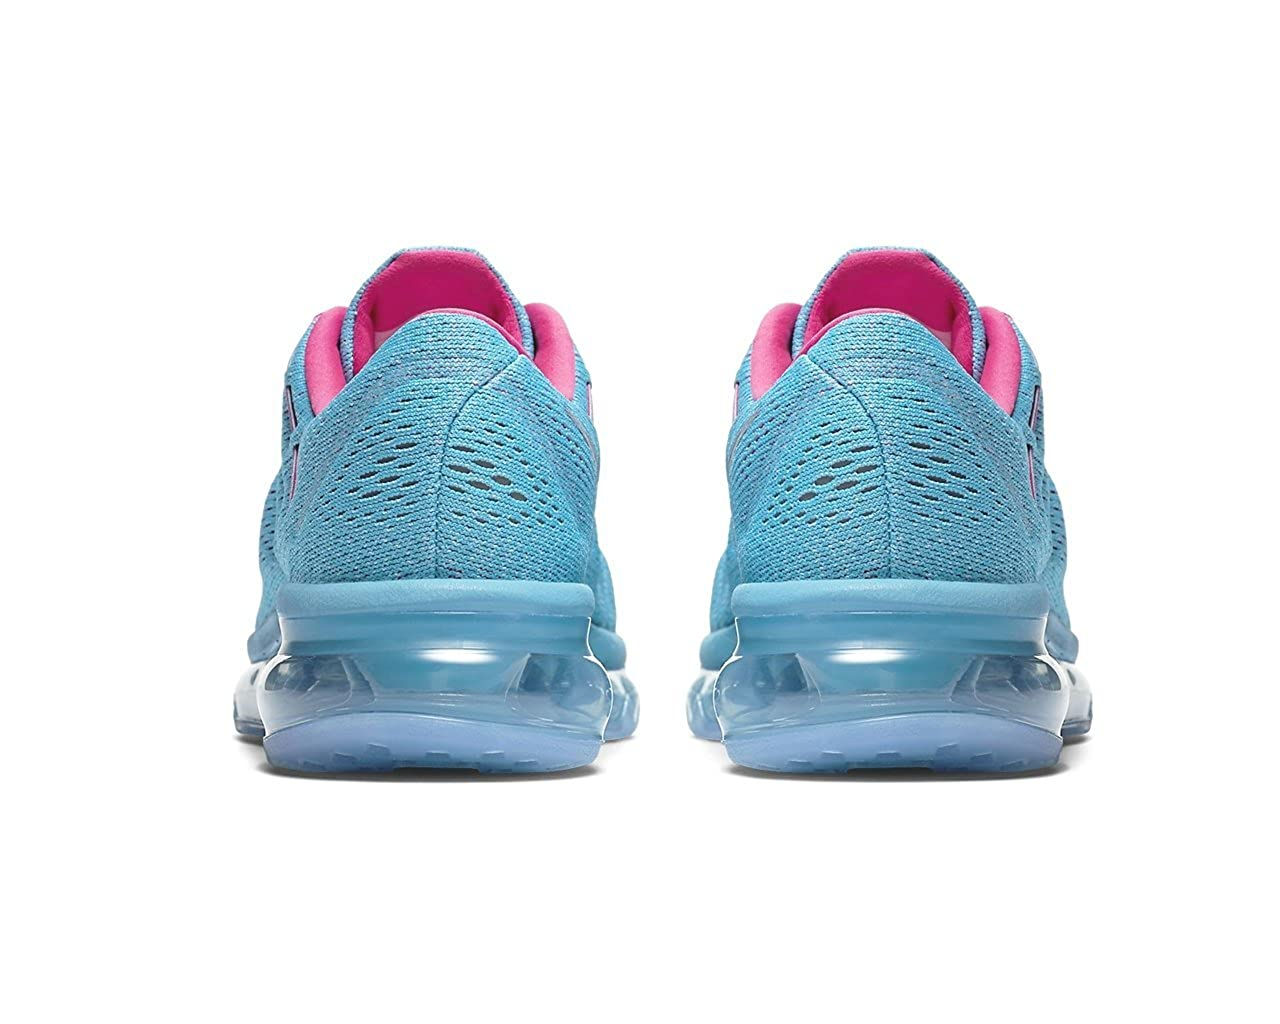 en soldes afa54 5bdab NIKE Air Max 2016 (GS), Chaussures de Running Entrainement Fille